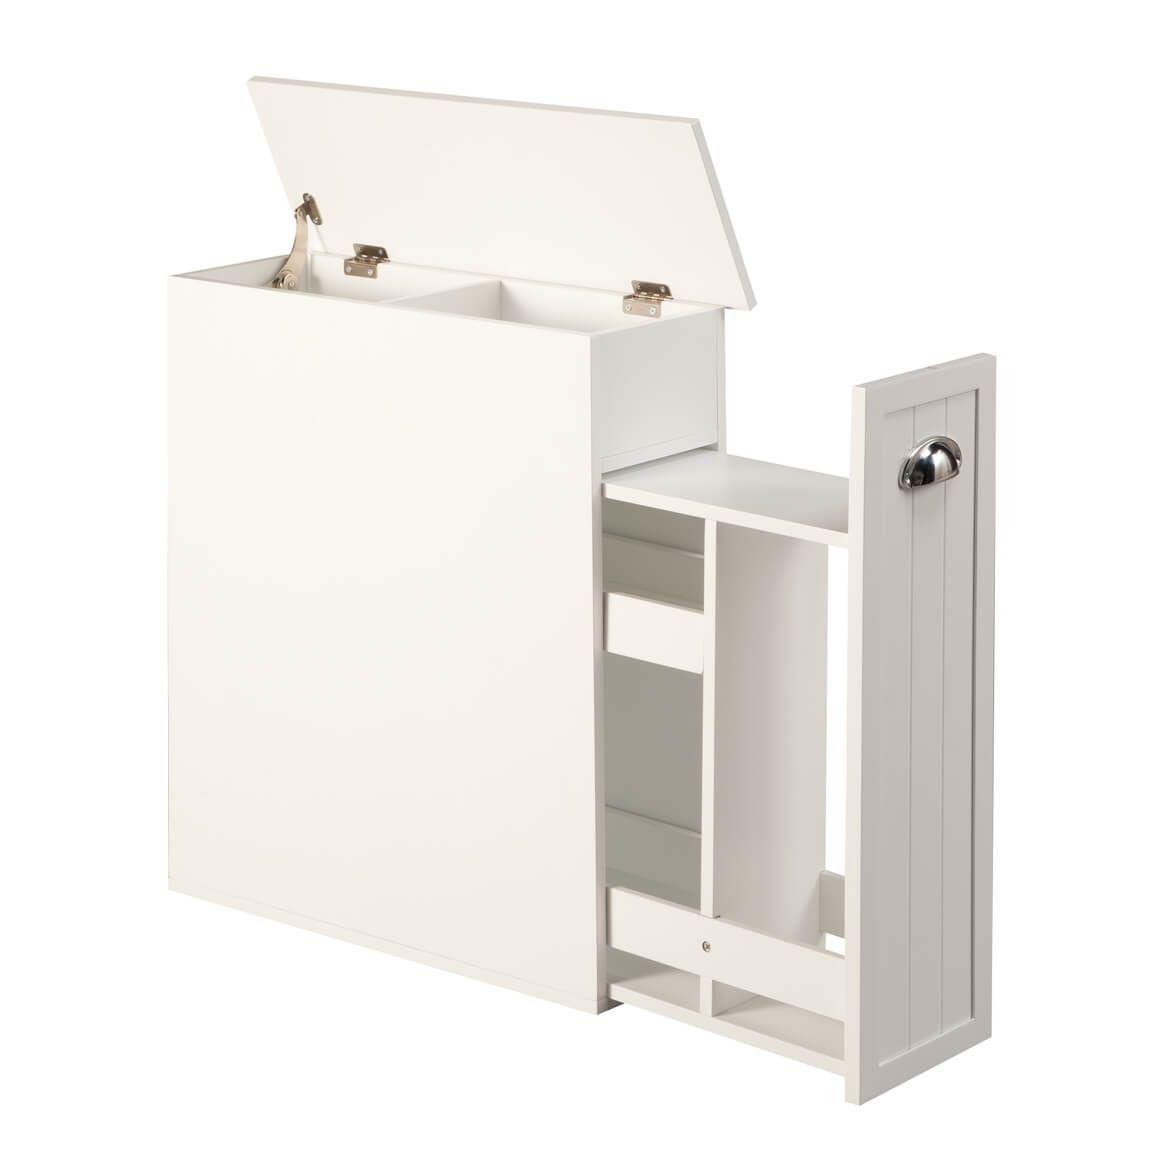 Walter Drake Slim Bathroom Storage Cabinet By Oakridge Provides Expansive Storage Slim Bathroom Storage Cabinet Slim Bathroom Storage Bathroom Storage Cabinet